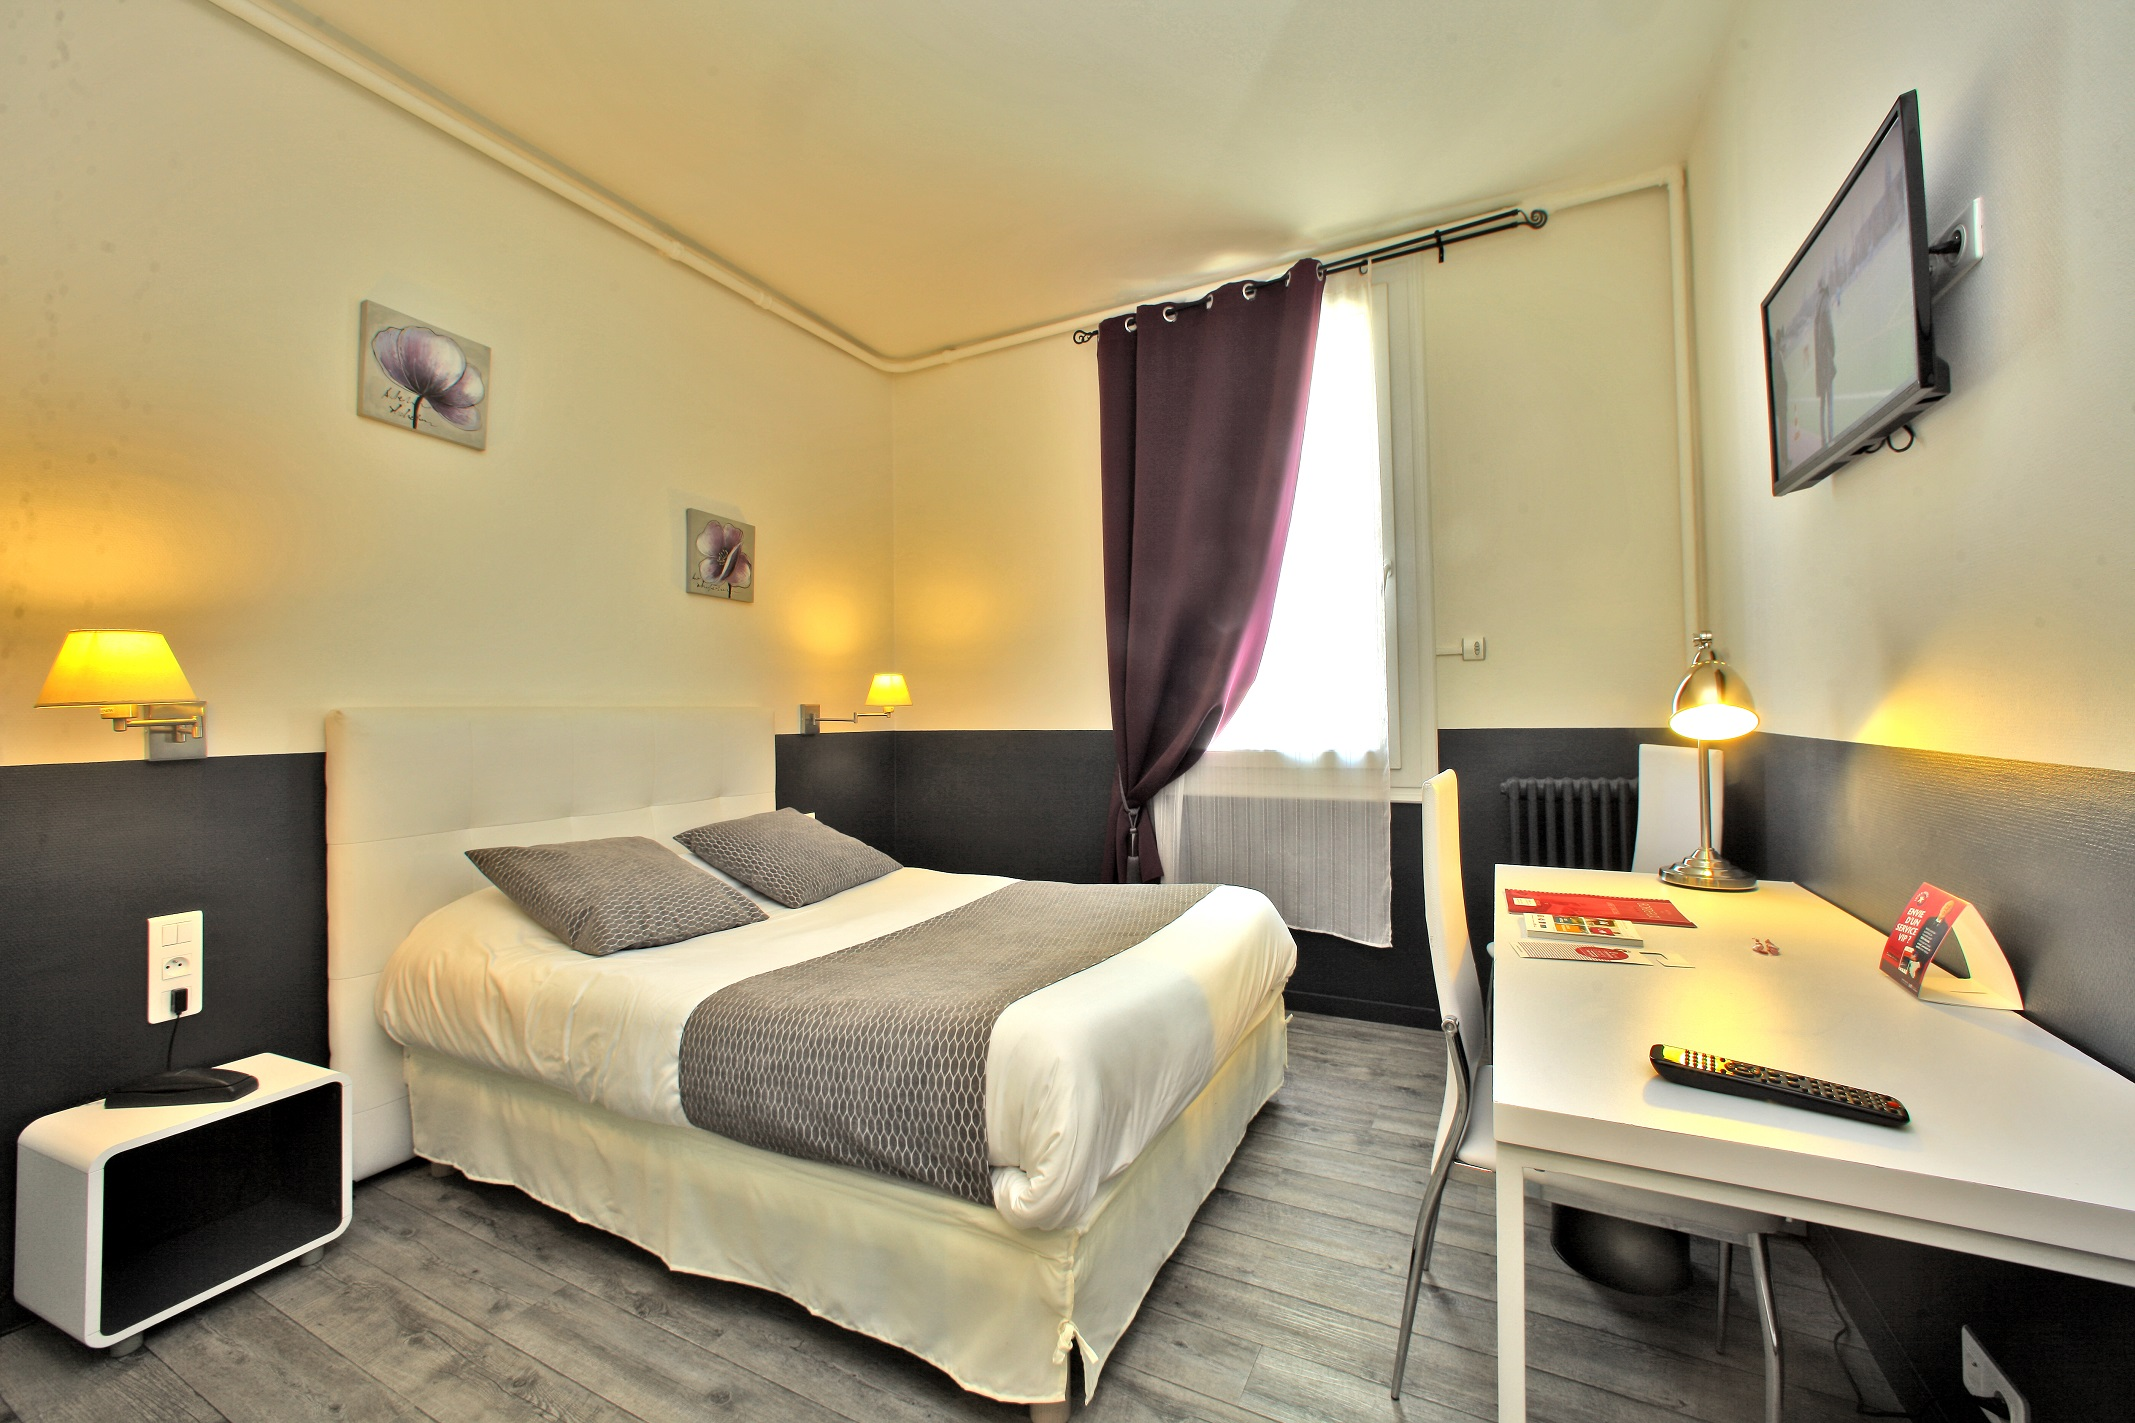 Inter Hotel Bergerac De Bordeaux Hotel 3 Star Aquitaine # Meuble Tv Sonorise